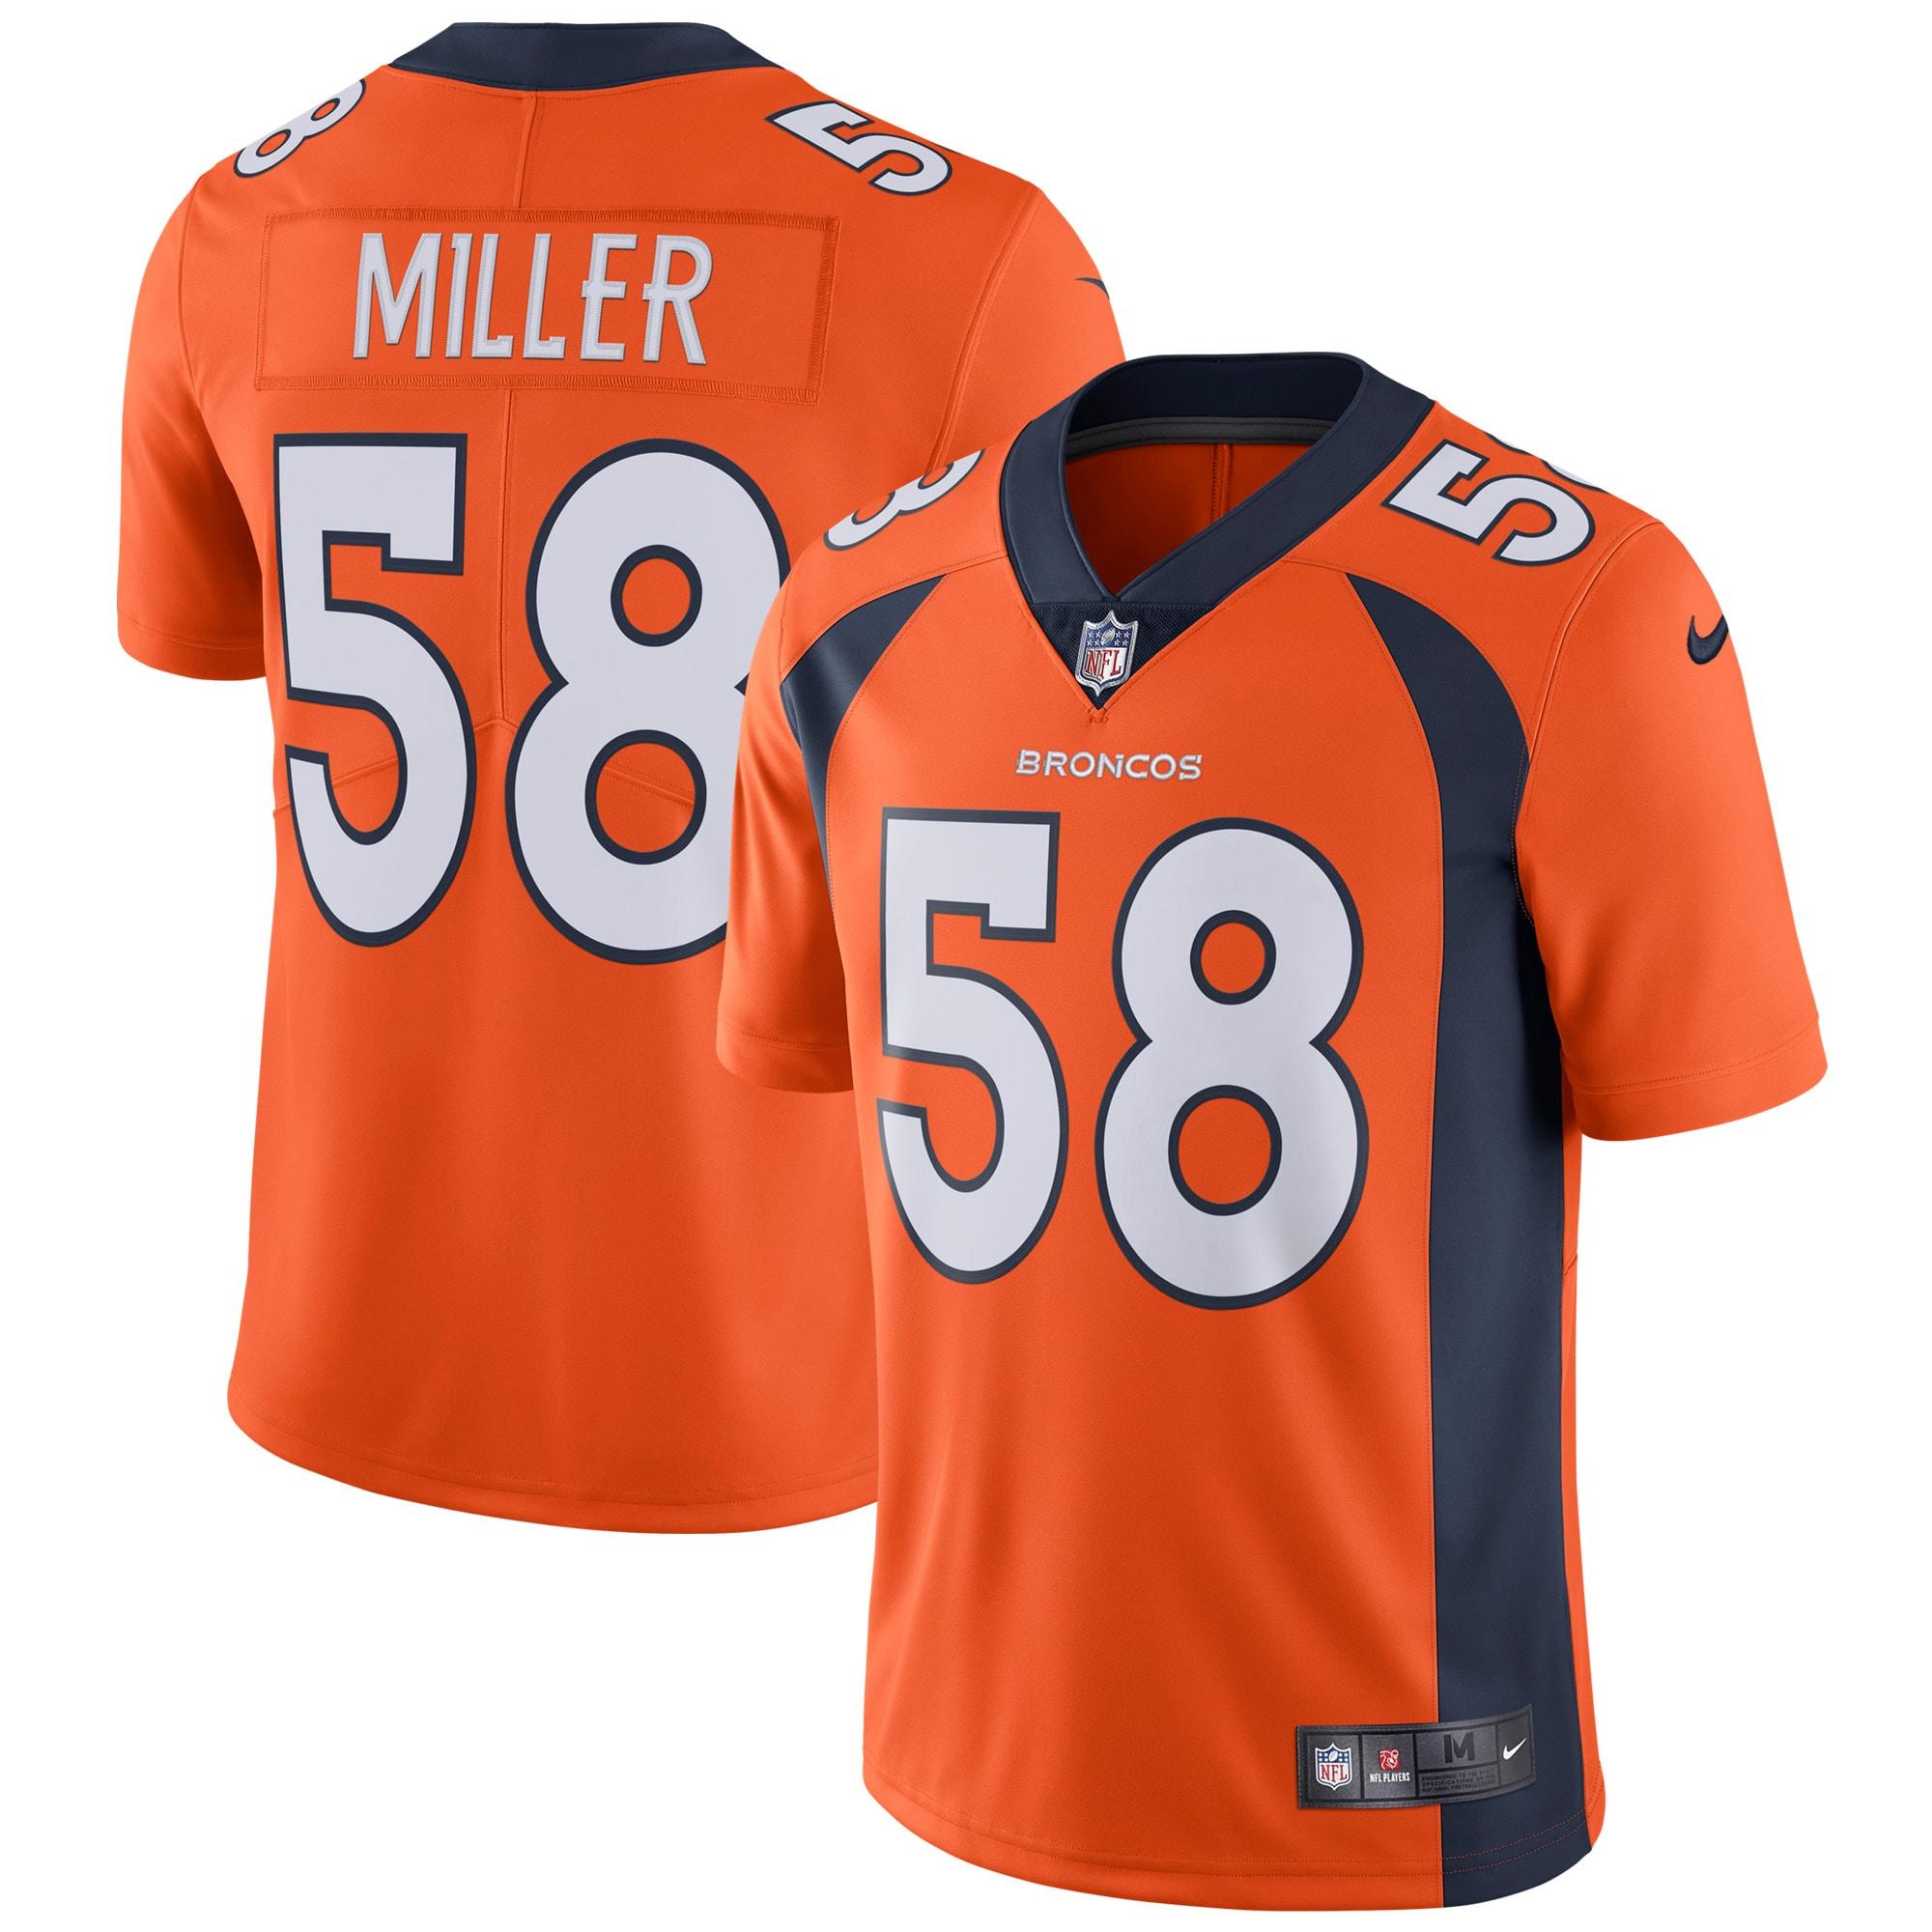 Von Miller Denver Broncos Nike Vapor Untouchable Limited Player Jersey - Orange